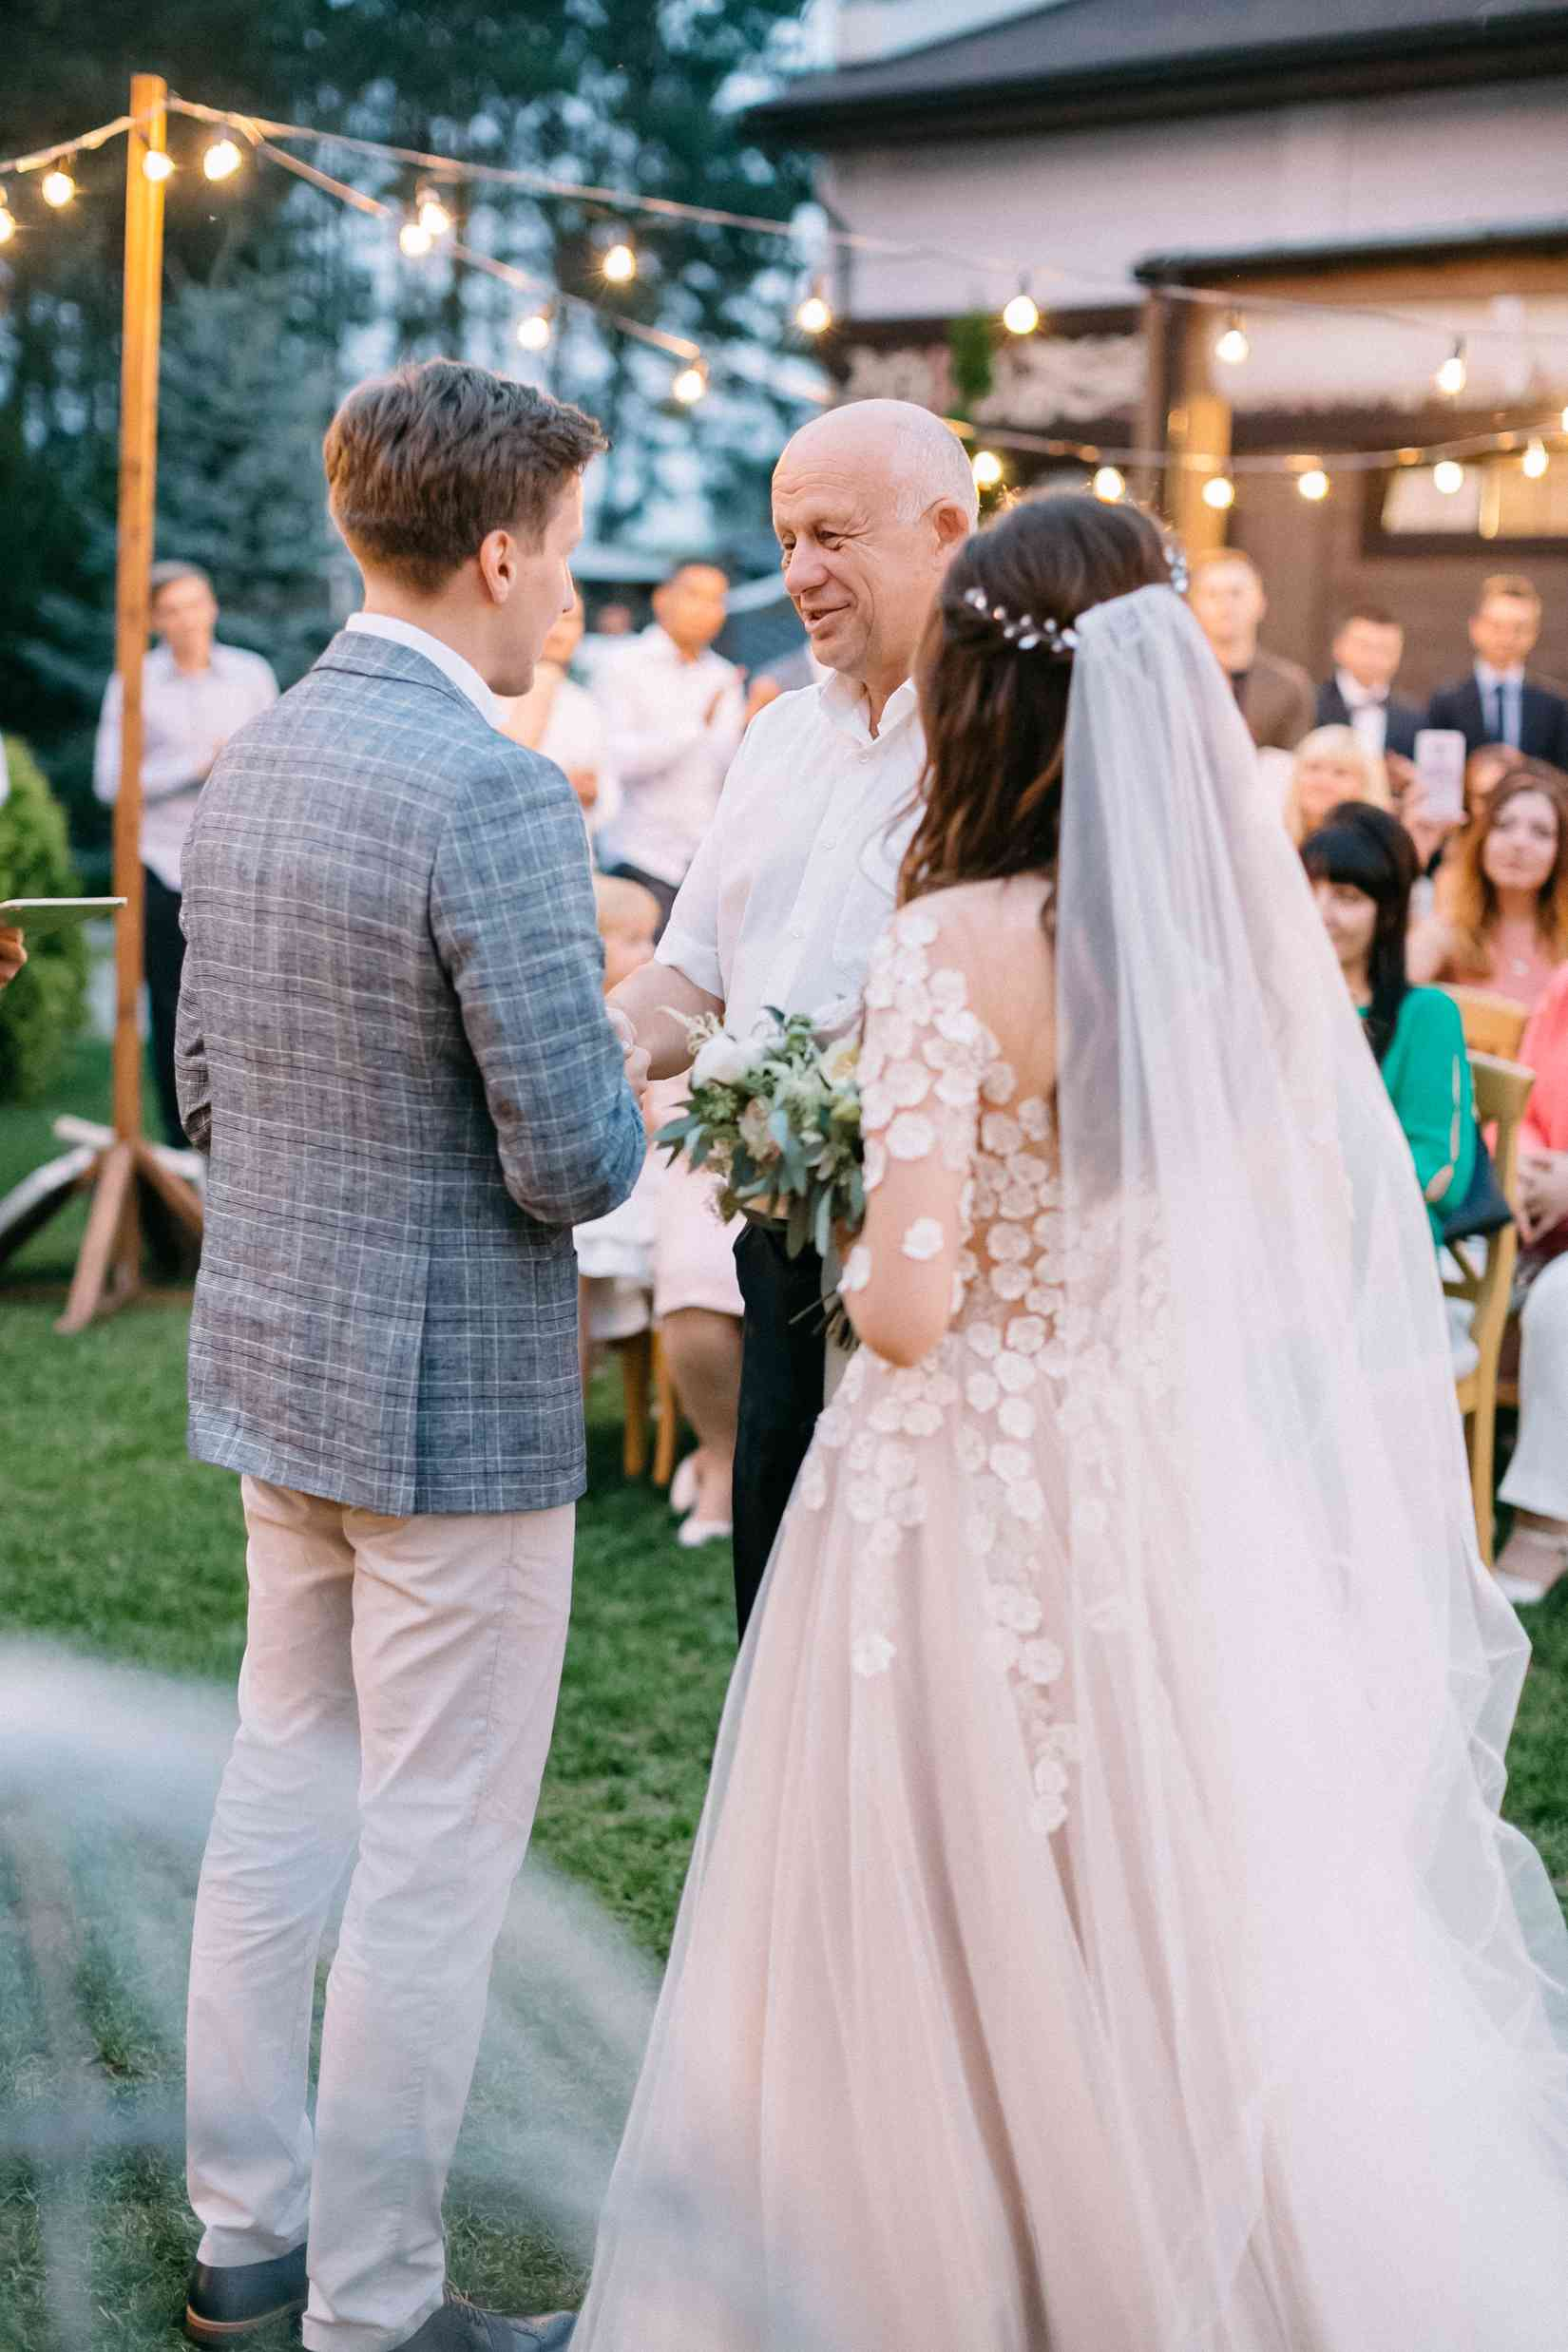 папа передает невесту жениху